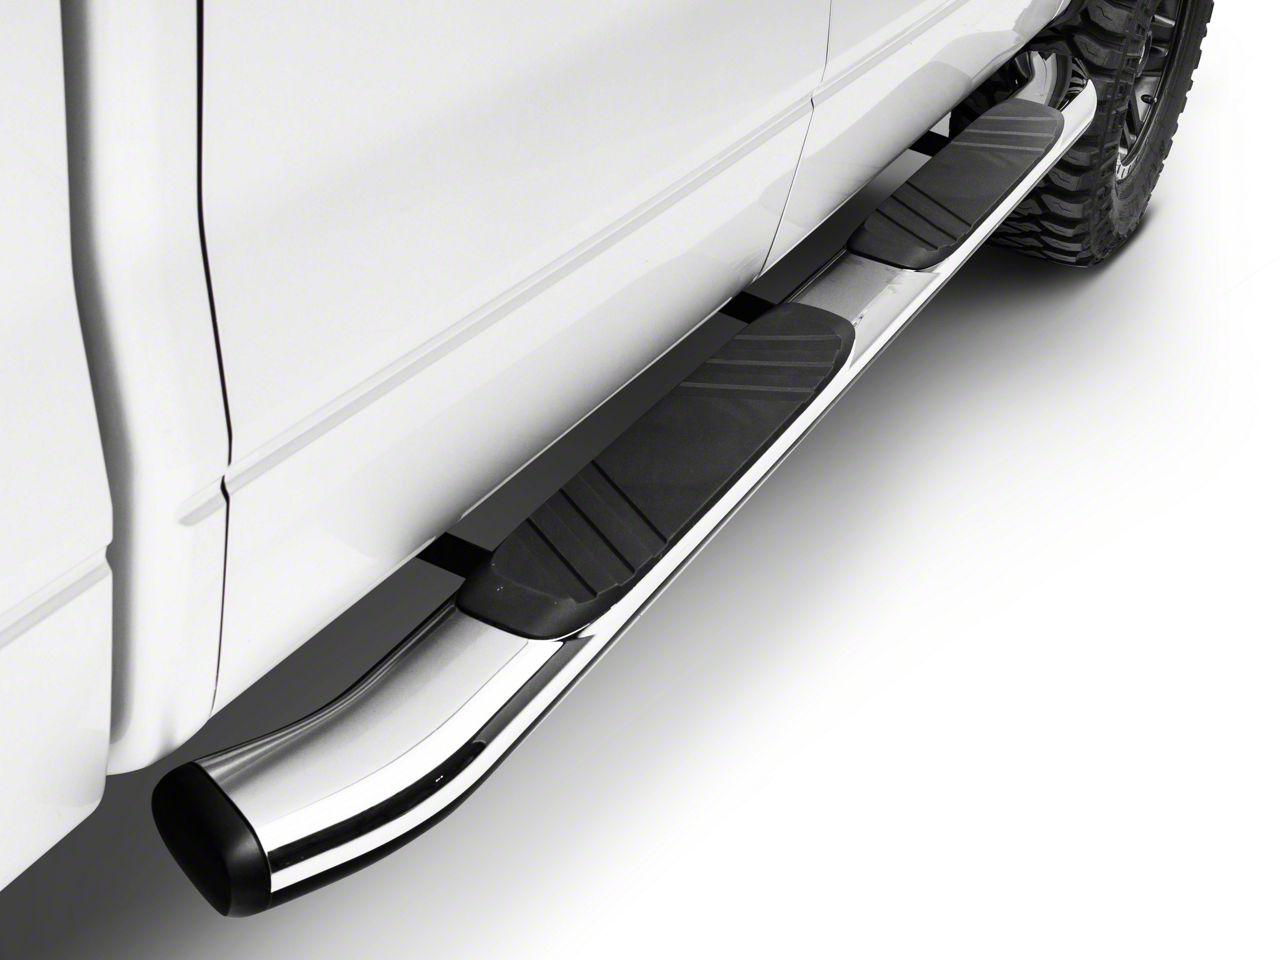 Go Rhino 5 in. OE Xtreme Composite Side Step Bars - Chrome (04-14 F-150 SuperCrew)